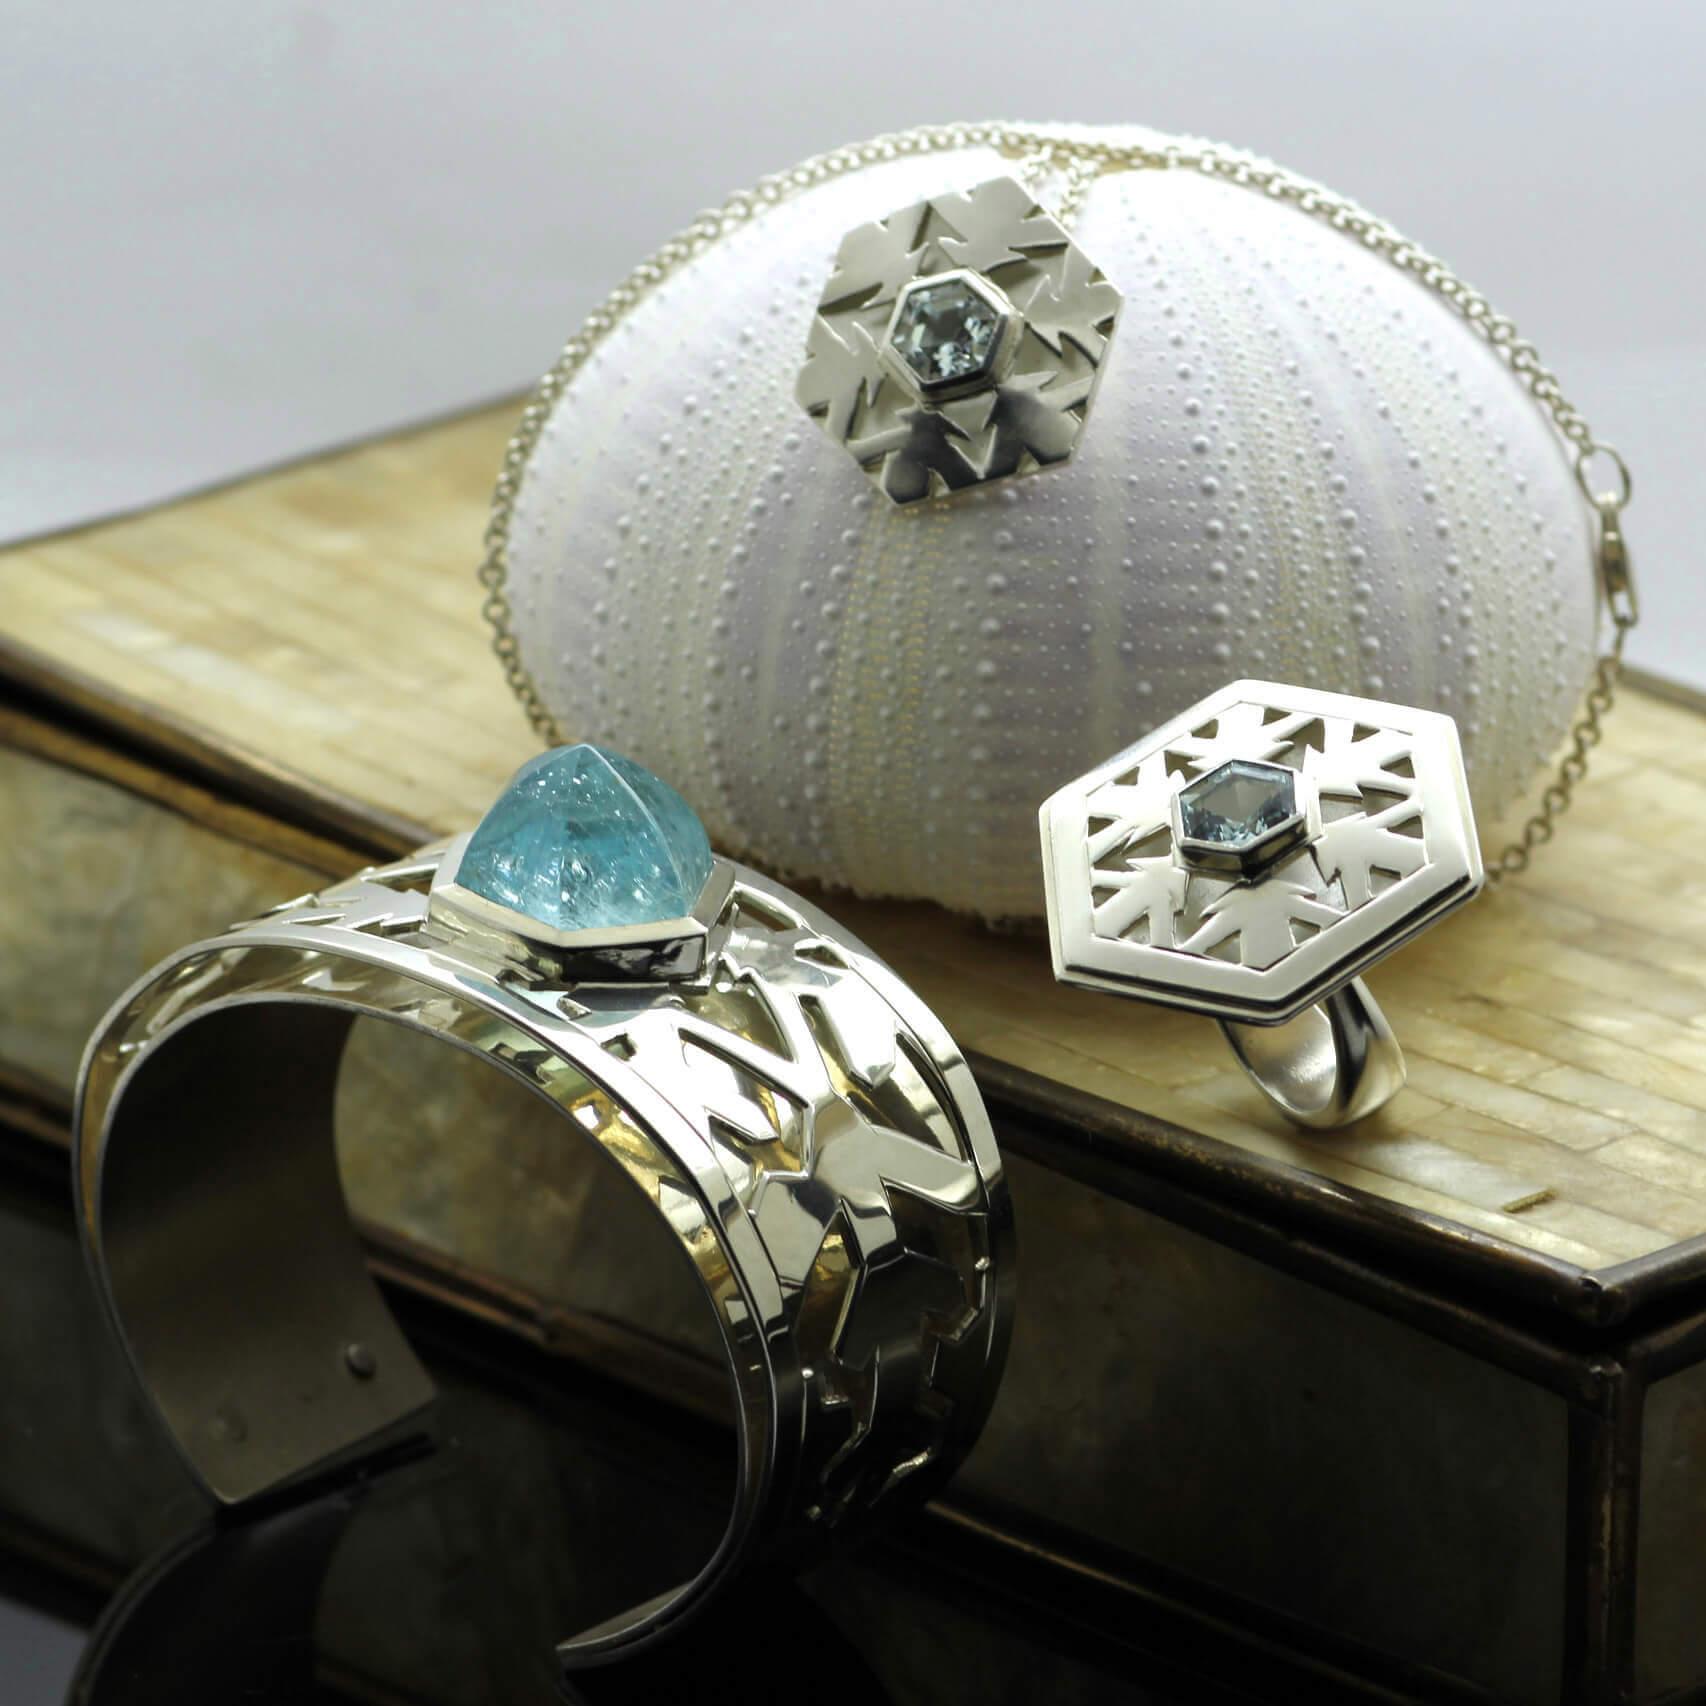 Birthstone jewellery Aquamarine gemstone contemporary statement jewellery